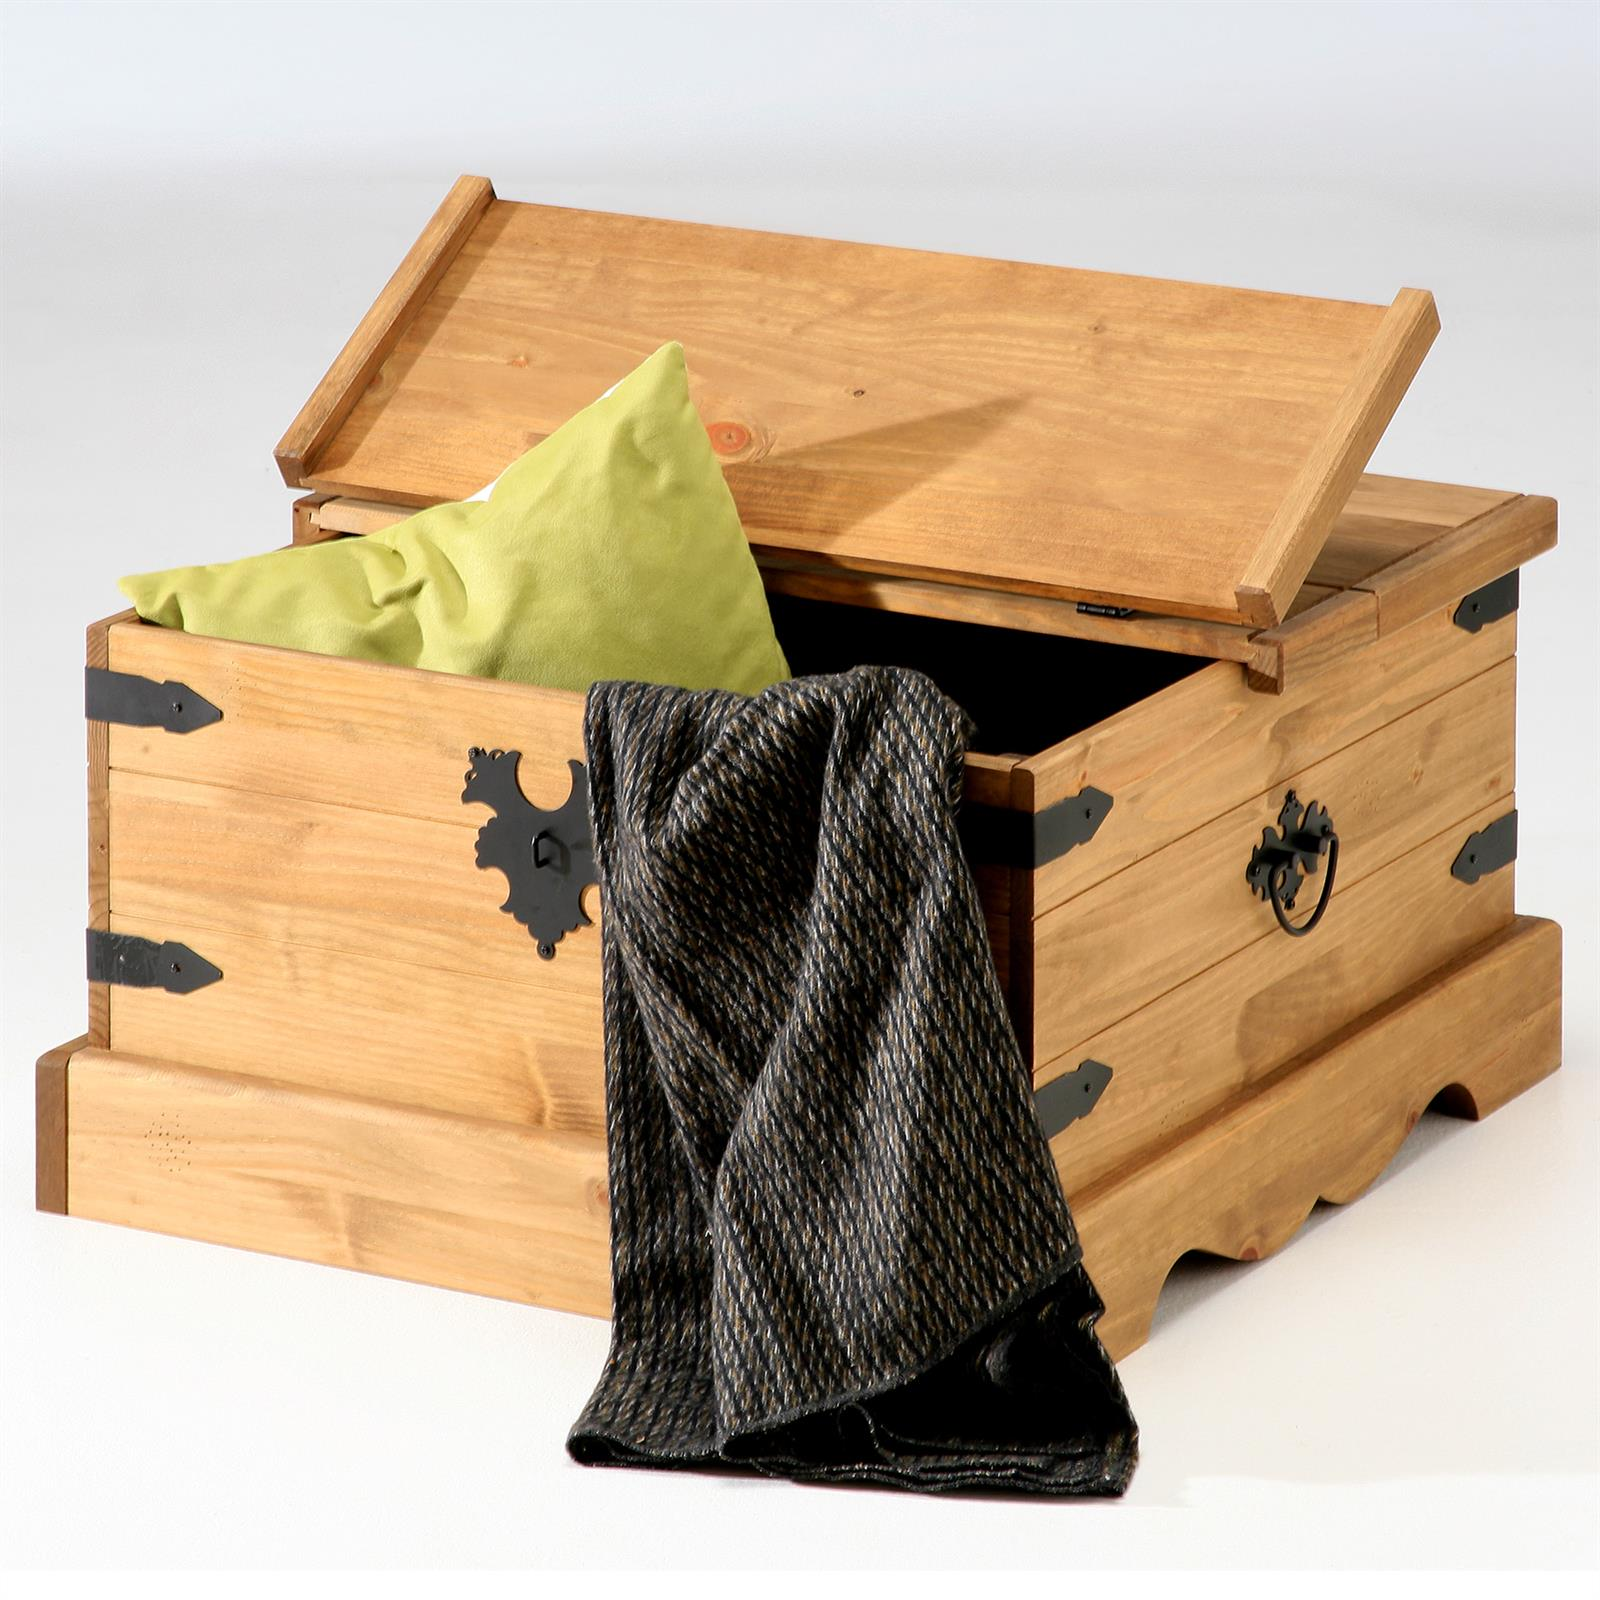 mexico m bel truhentisch tequila kiefer massiv mobilia24. Black Bedroom Furniture Sets. Home Design Ideas